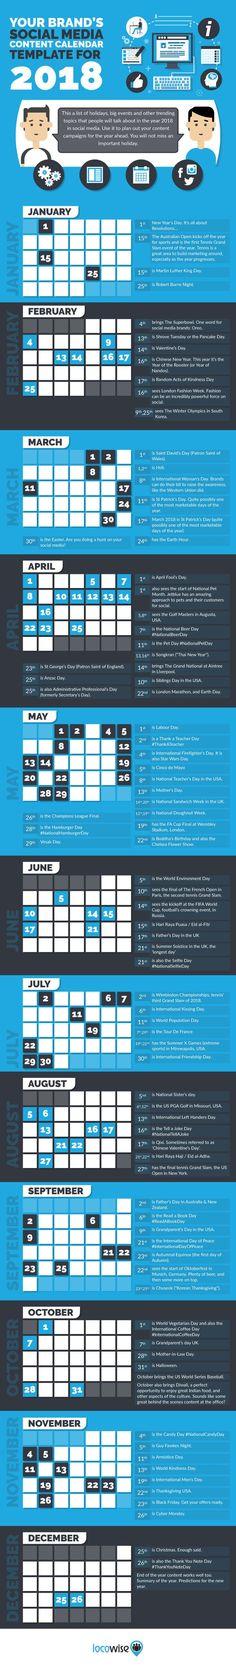 Your Brand's Social Media Content Calendar Template For 2018